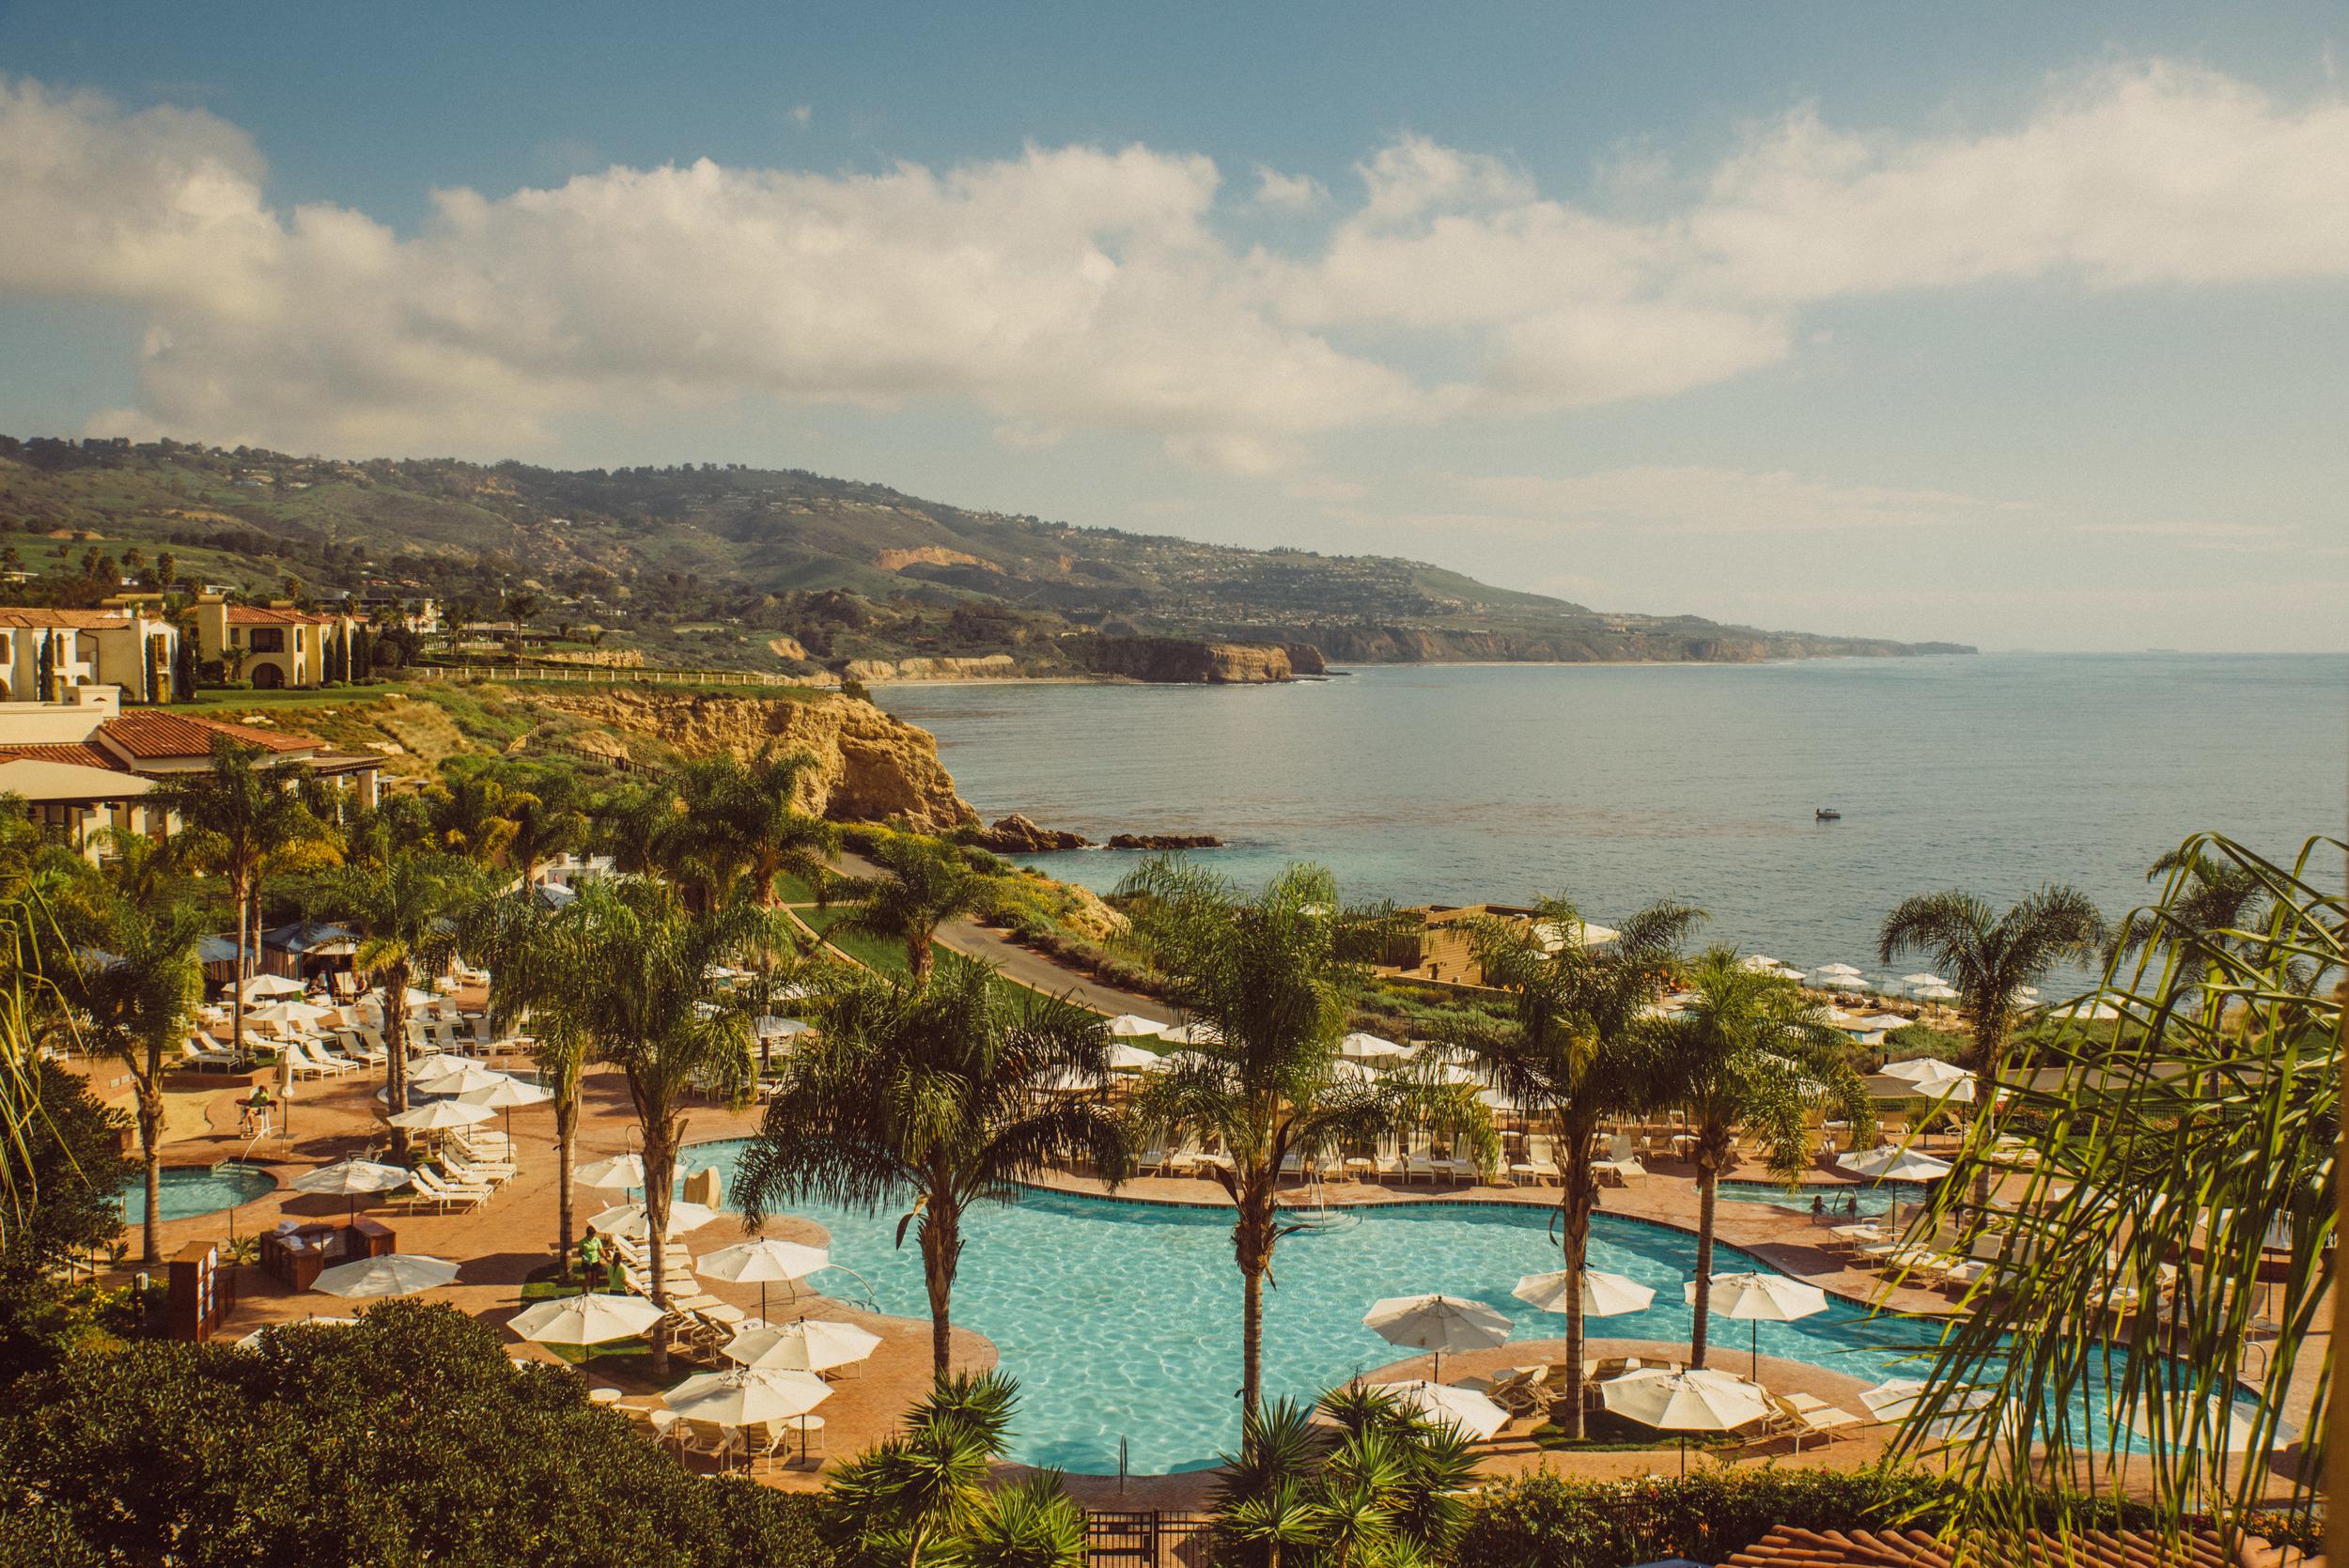 Cliff Ocean View Hotel Terranea